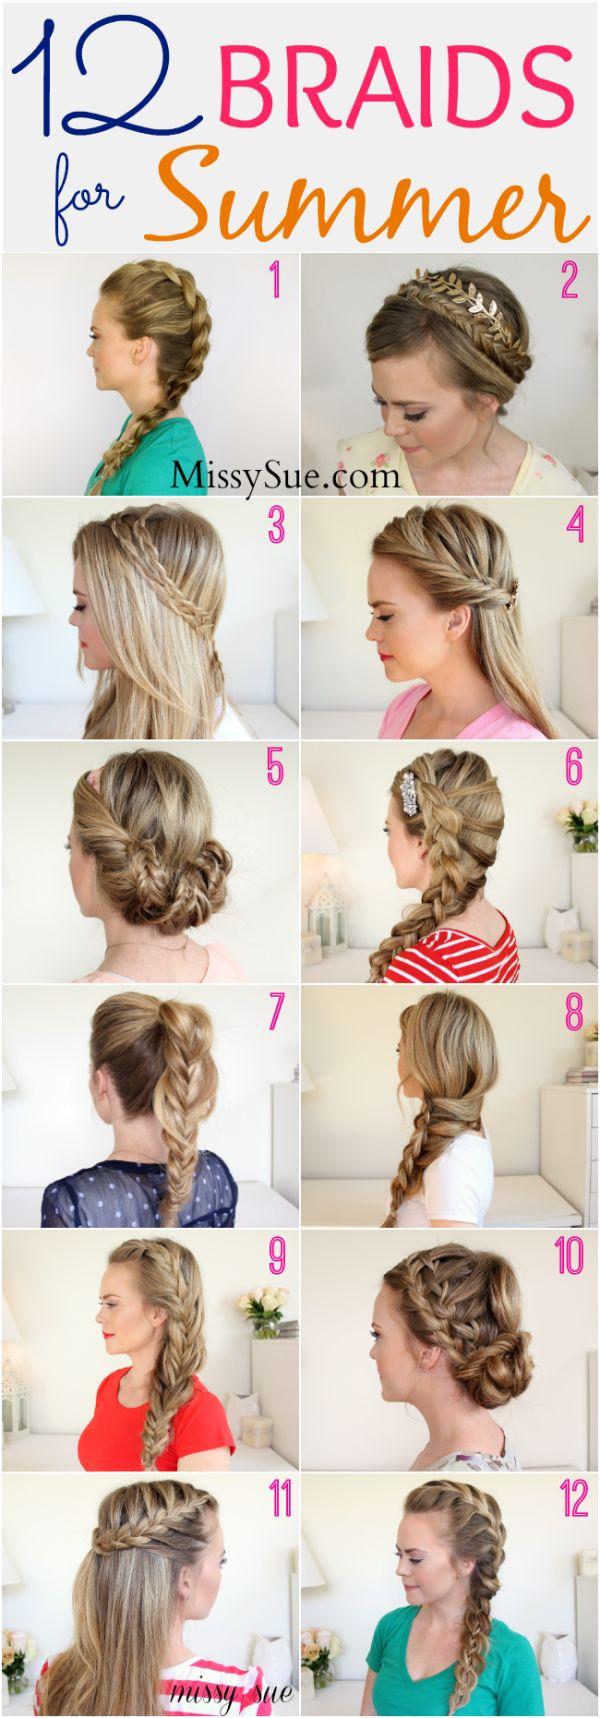 12 Braids for Summer   MissySue.com